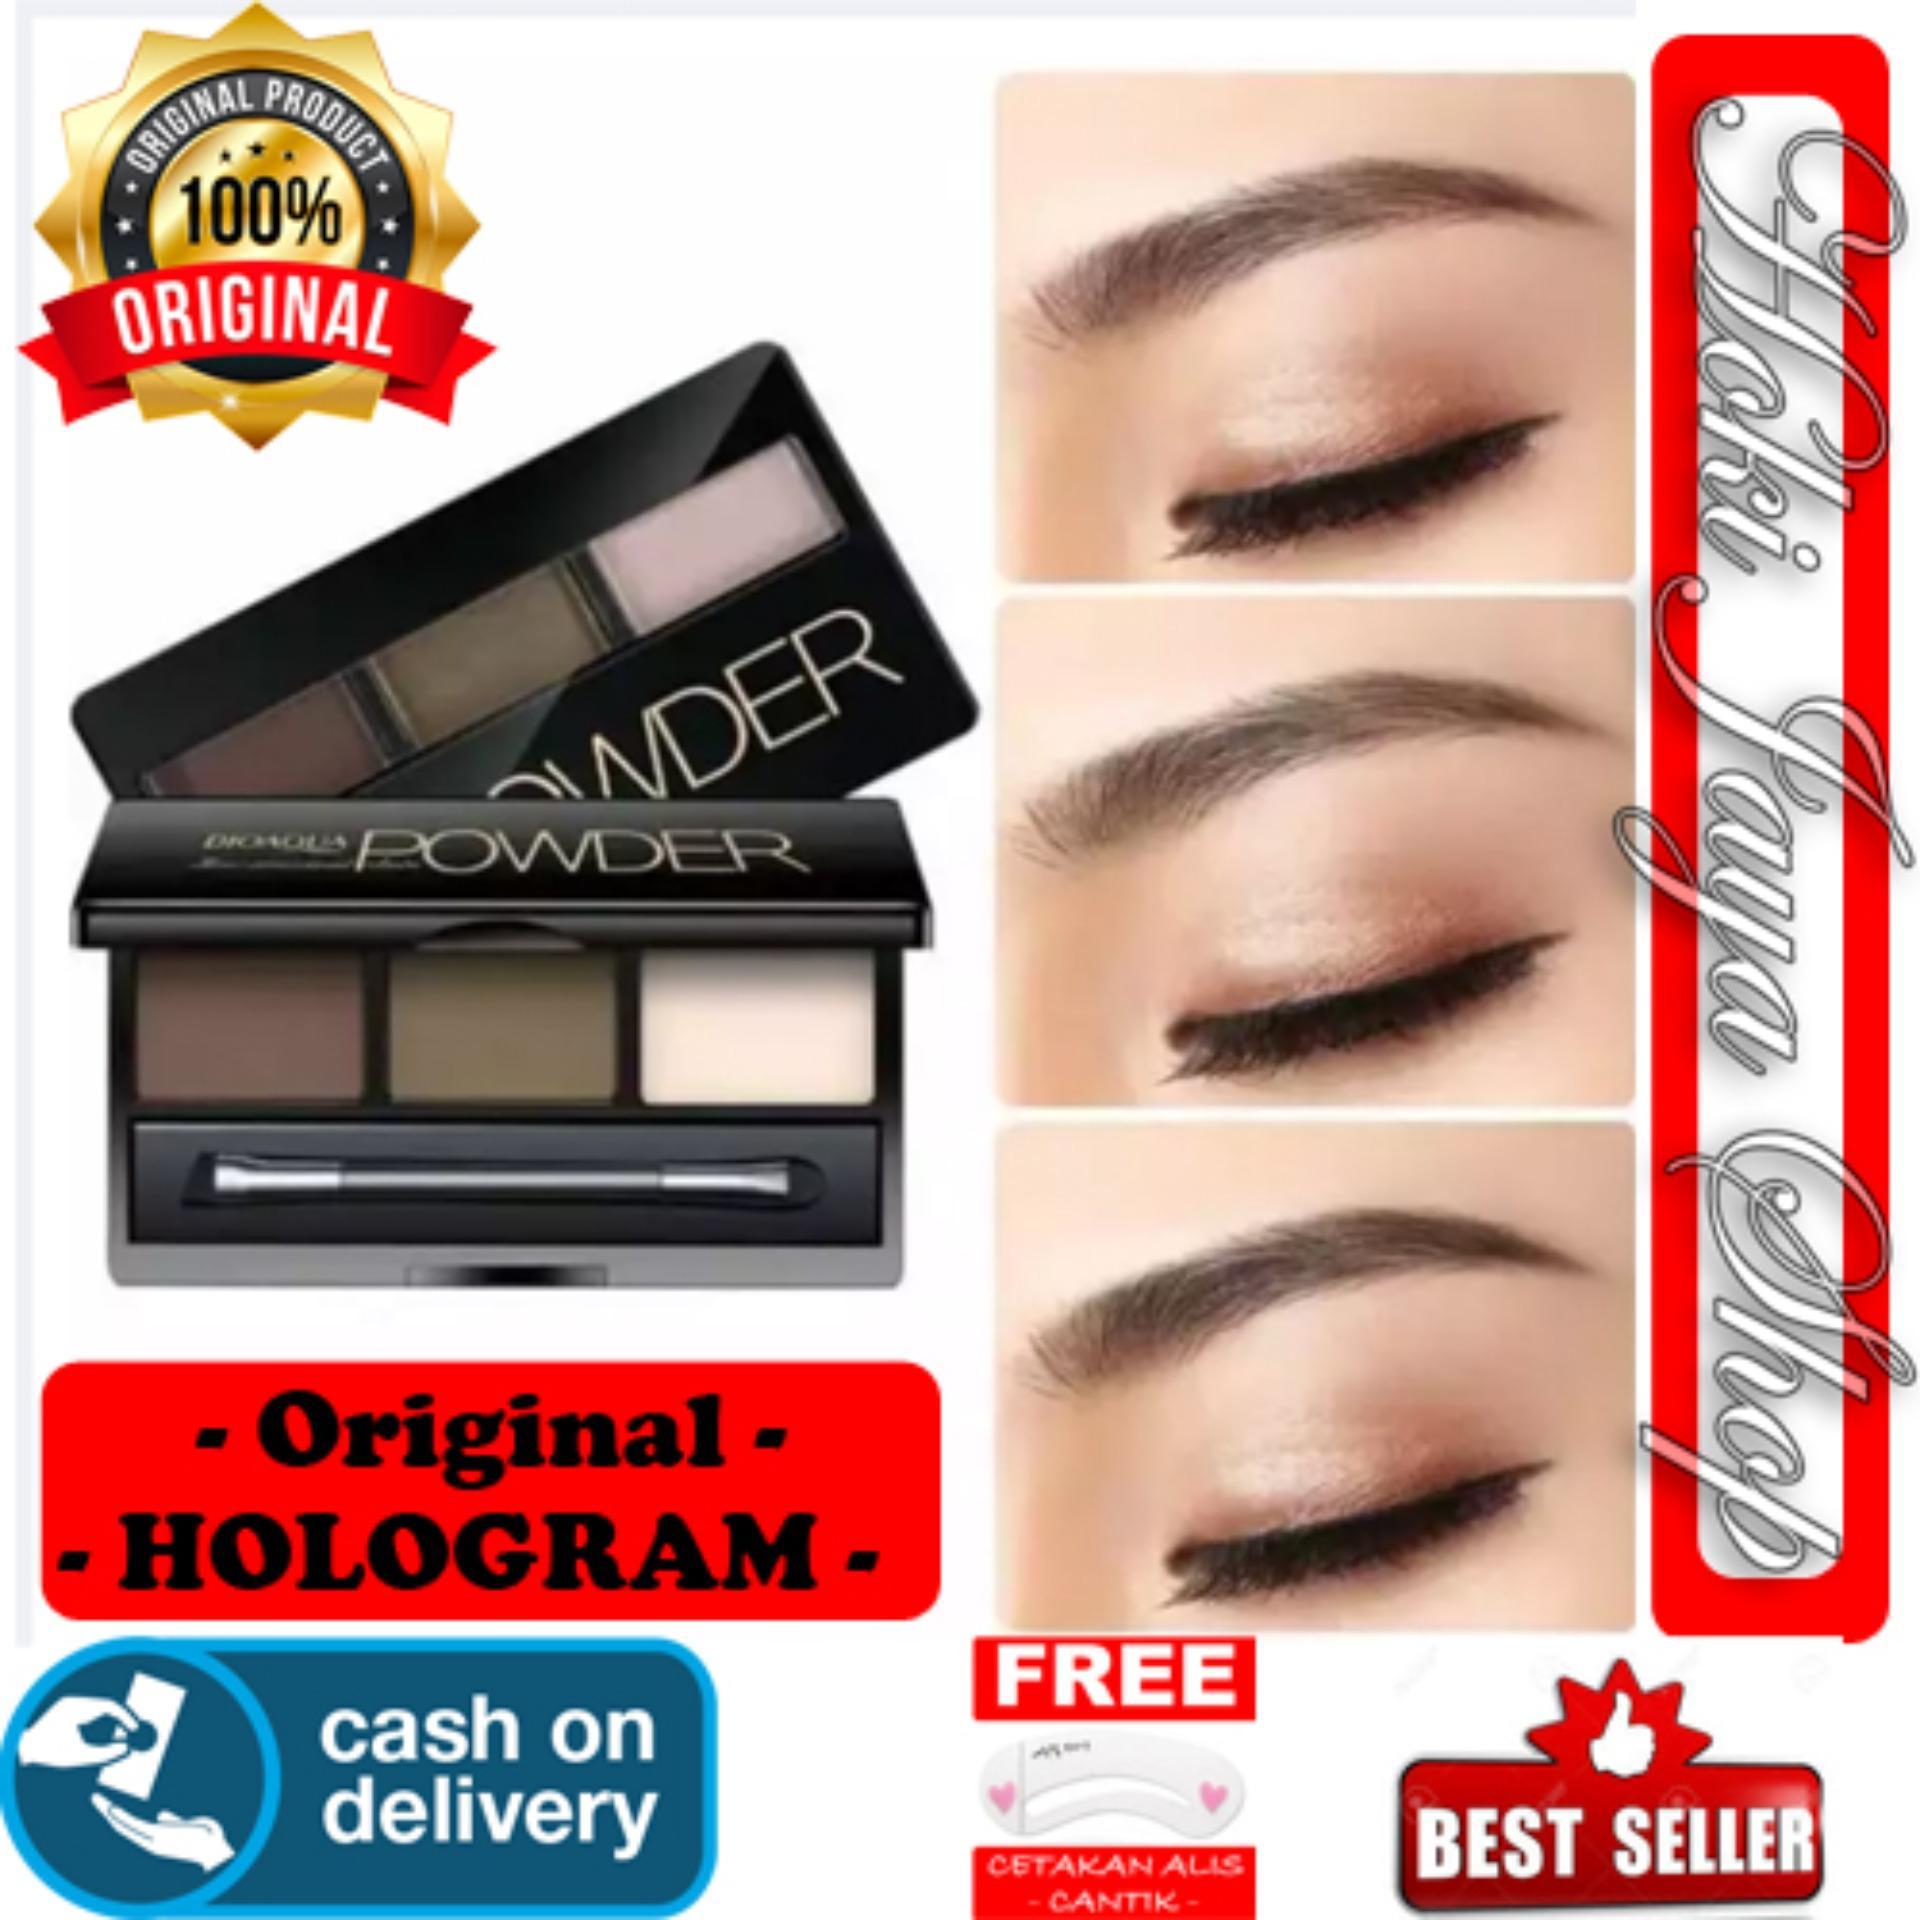 Buy Sell Cheapest Promo Cantik Eyebrow Best Quality Product Deals Template Cetak Alis Gagang Hoki Cod Bioaqua Professional Kit Eyeshadow Powder Menow Shezi Wax Palette Makeup